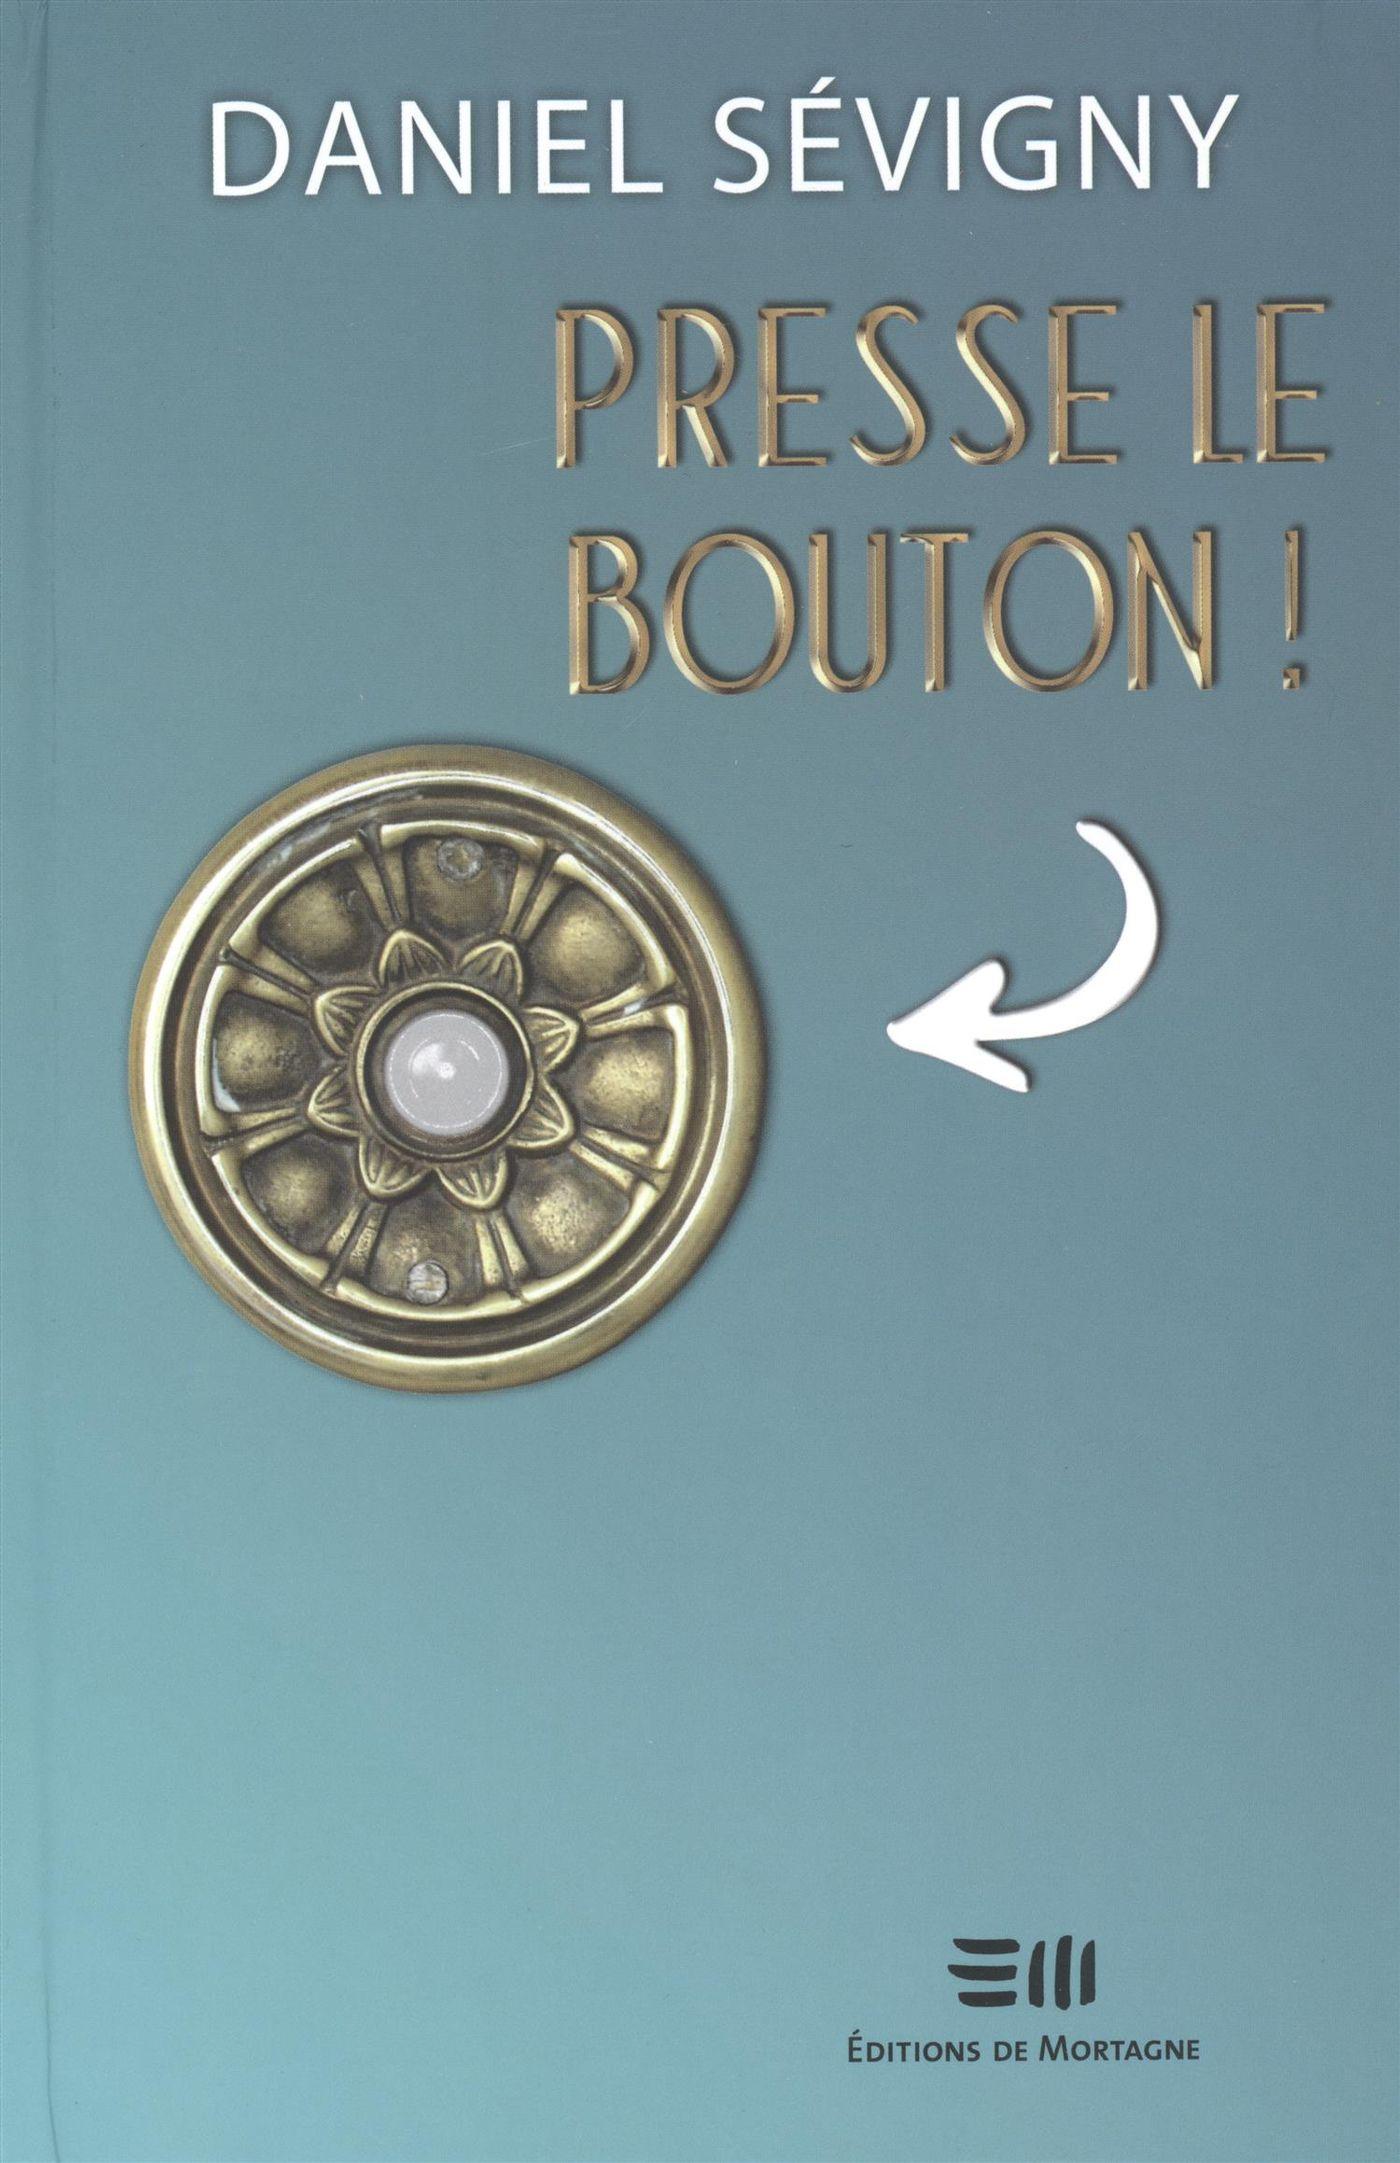 Presse le bouton!